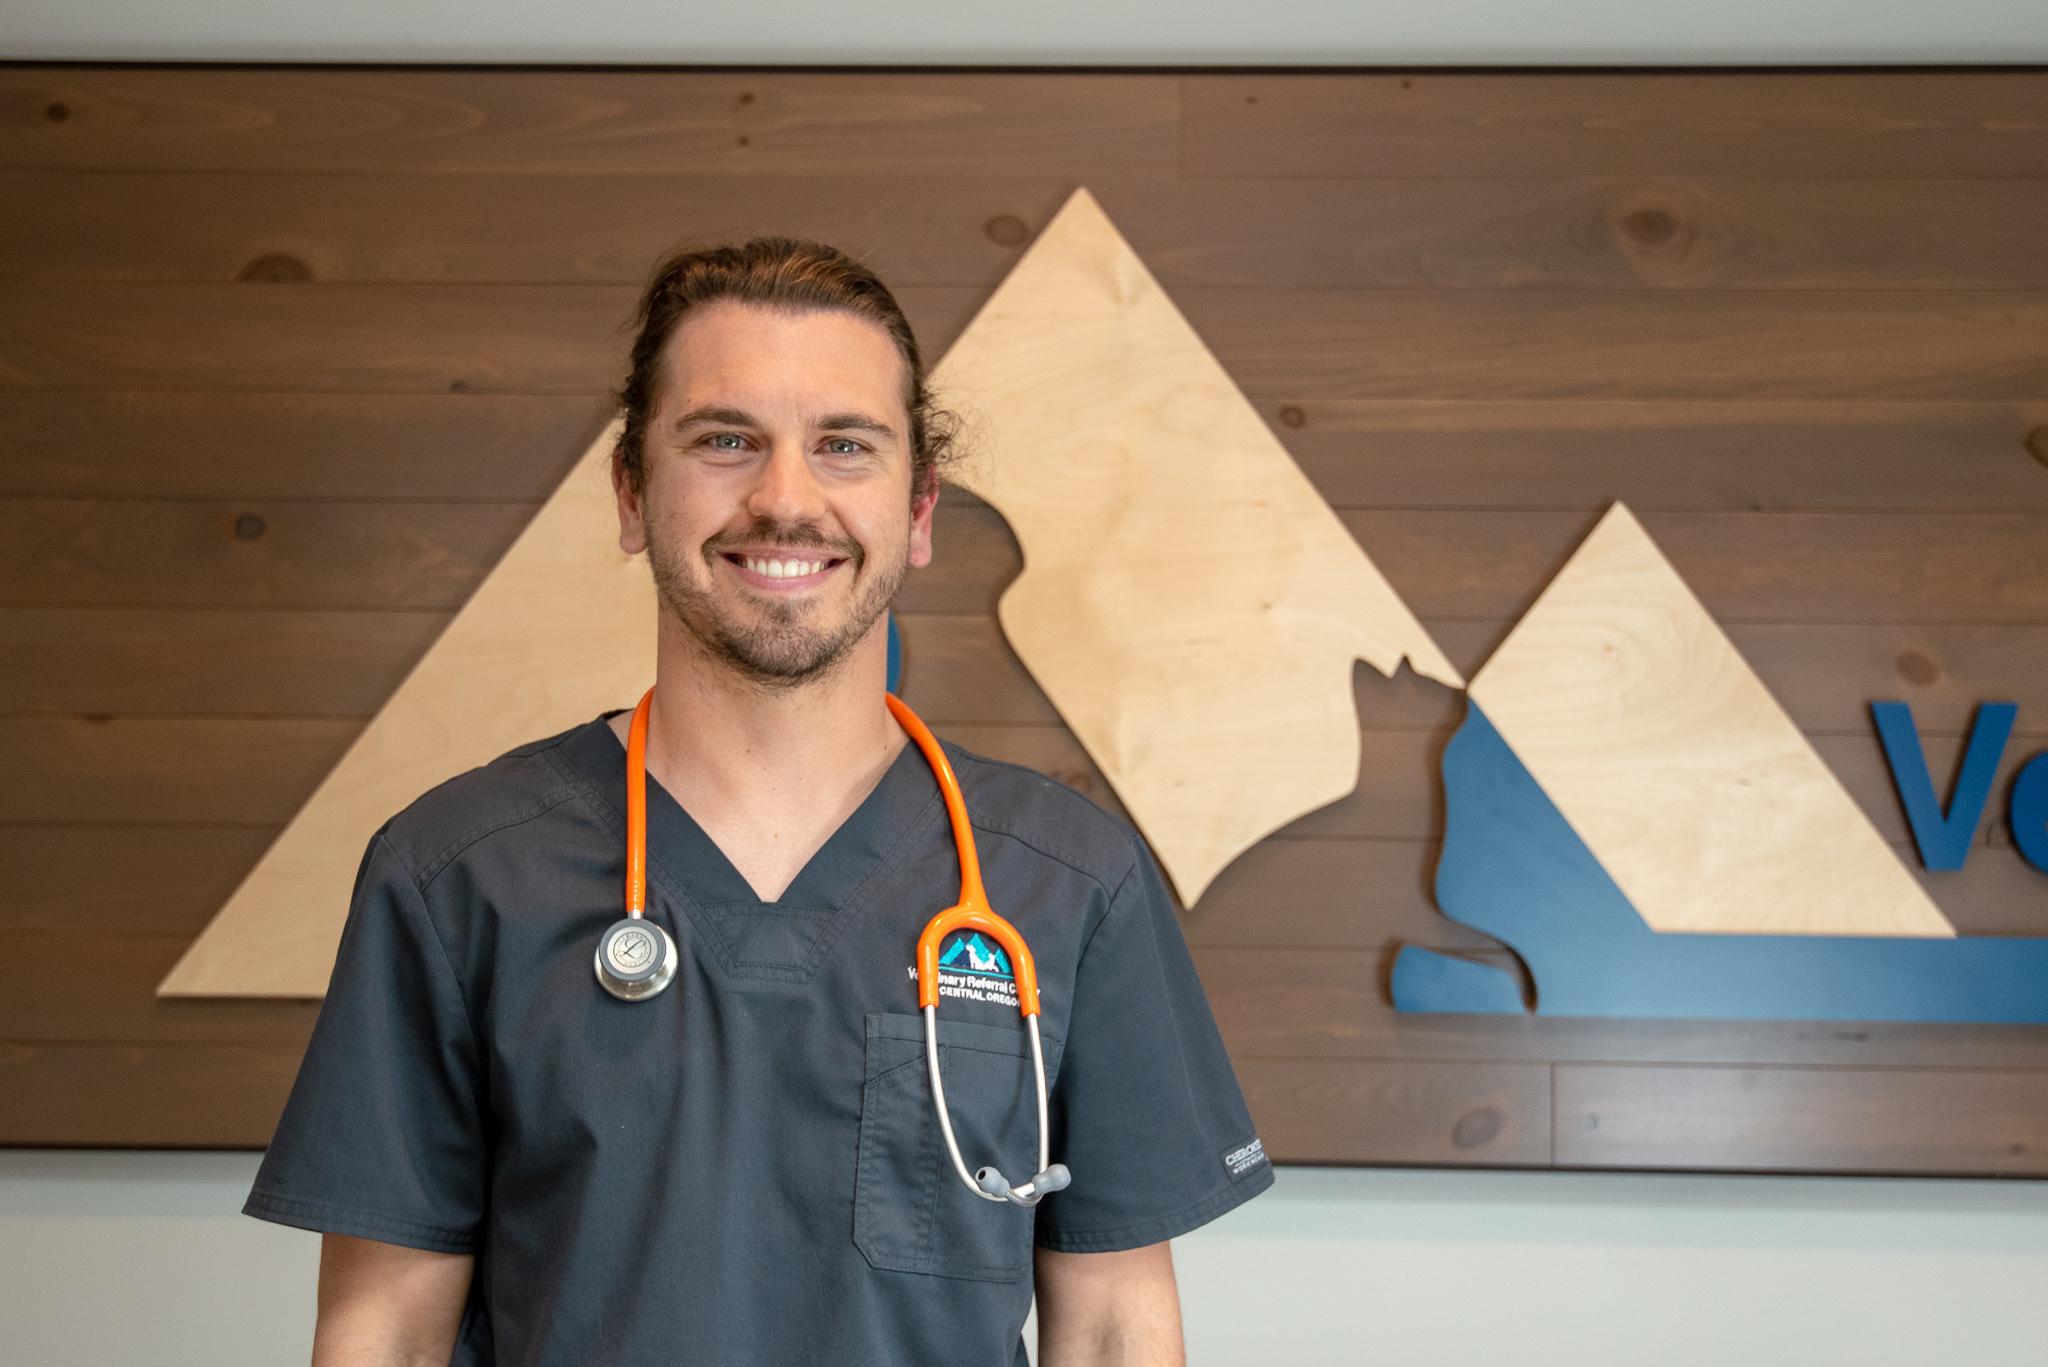 Emergency veterinarian Sean Panella